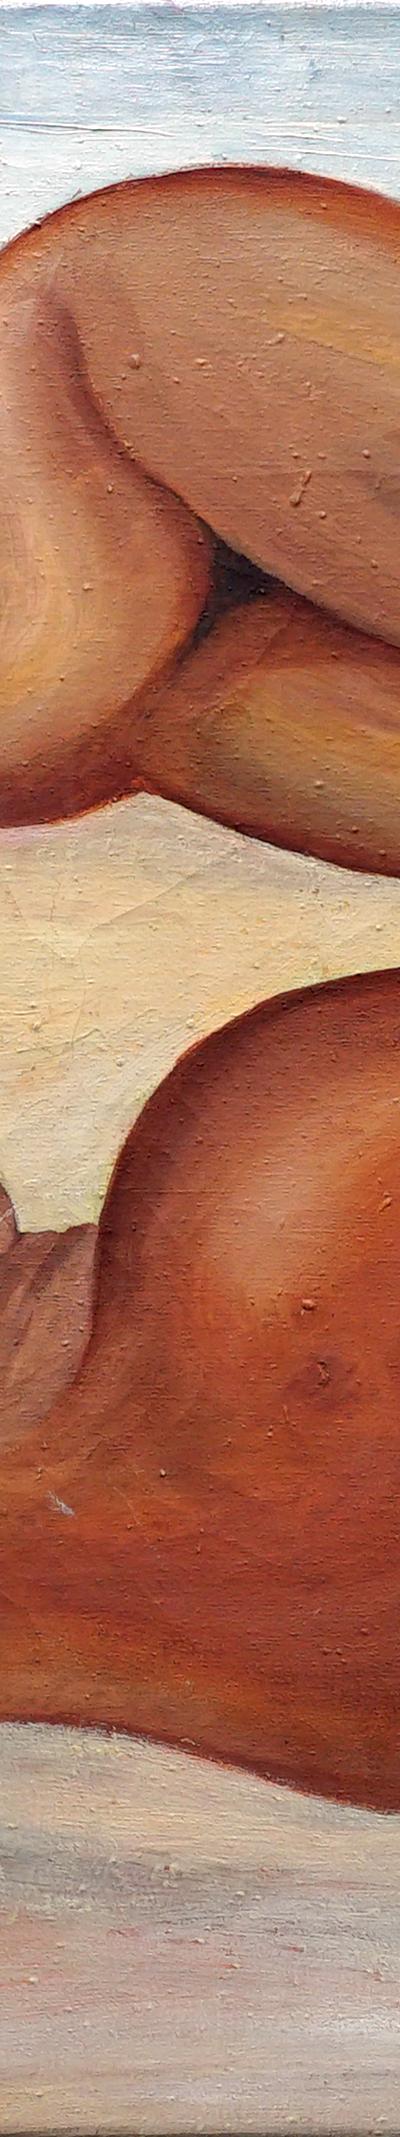 woman sunbathing 76x96 cm, oil on canvas